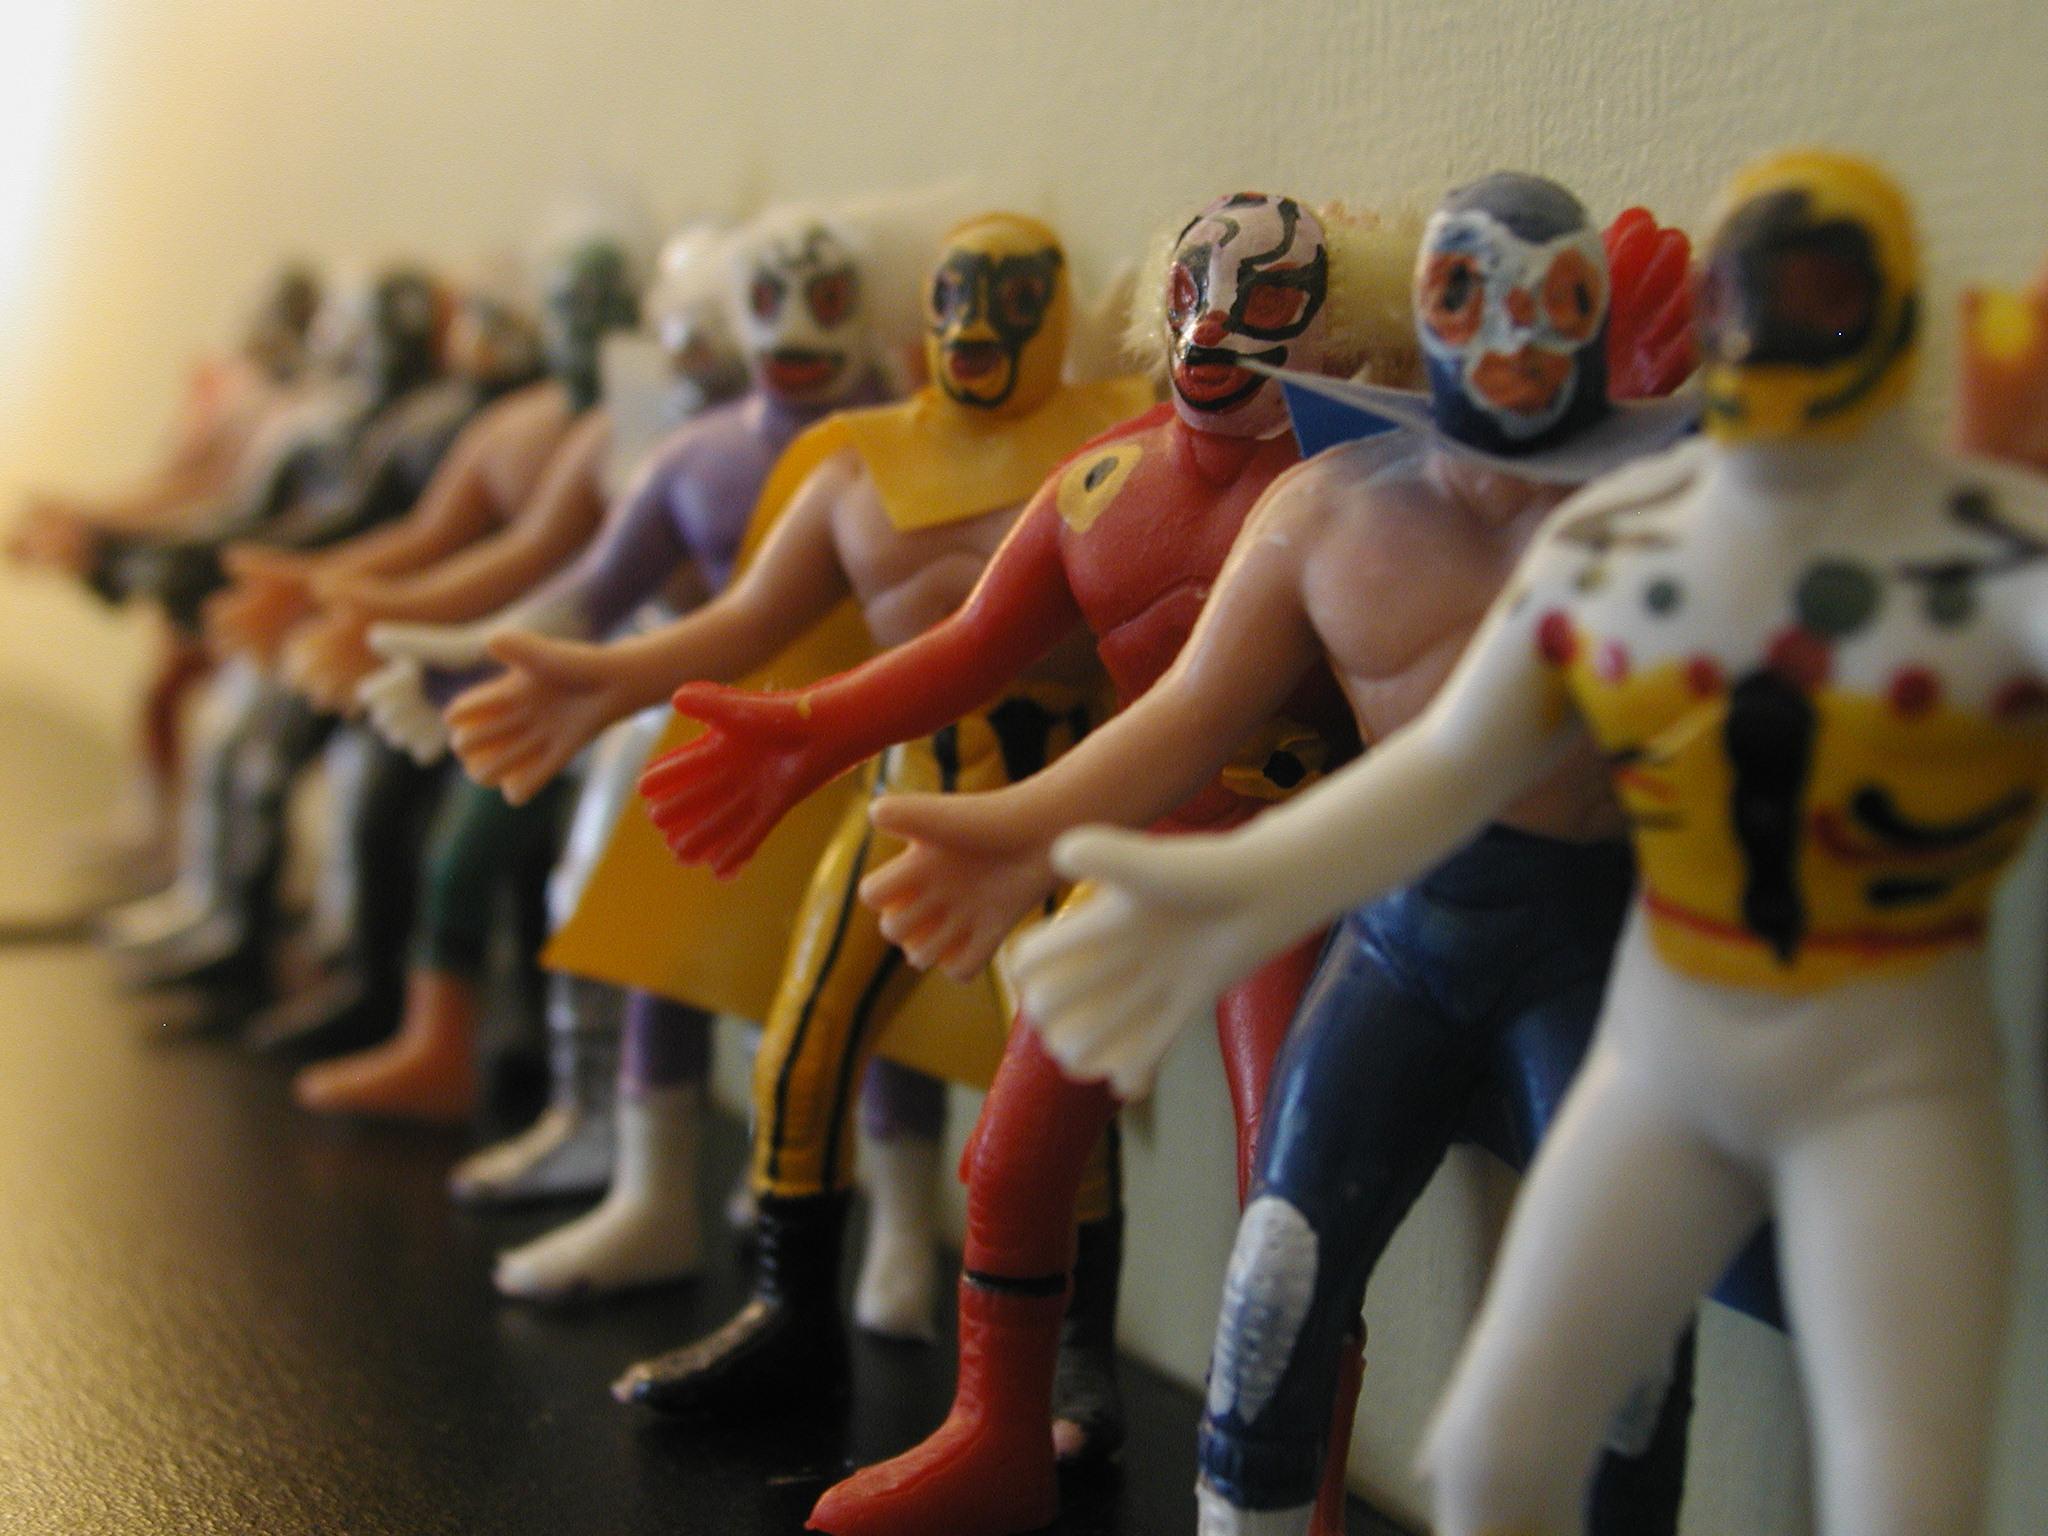 bootleg wrestling action figures